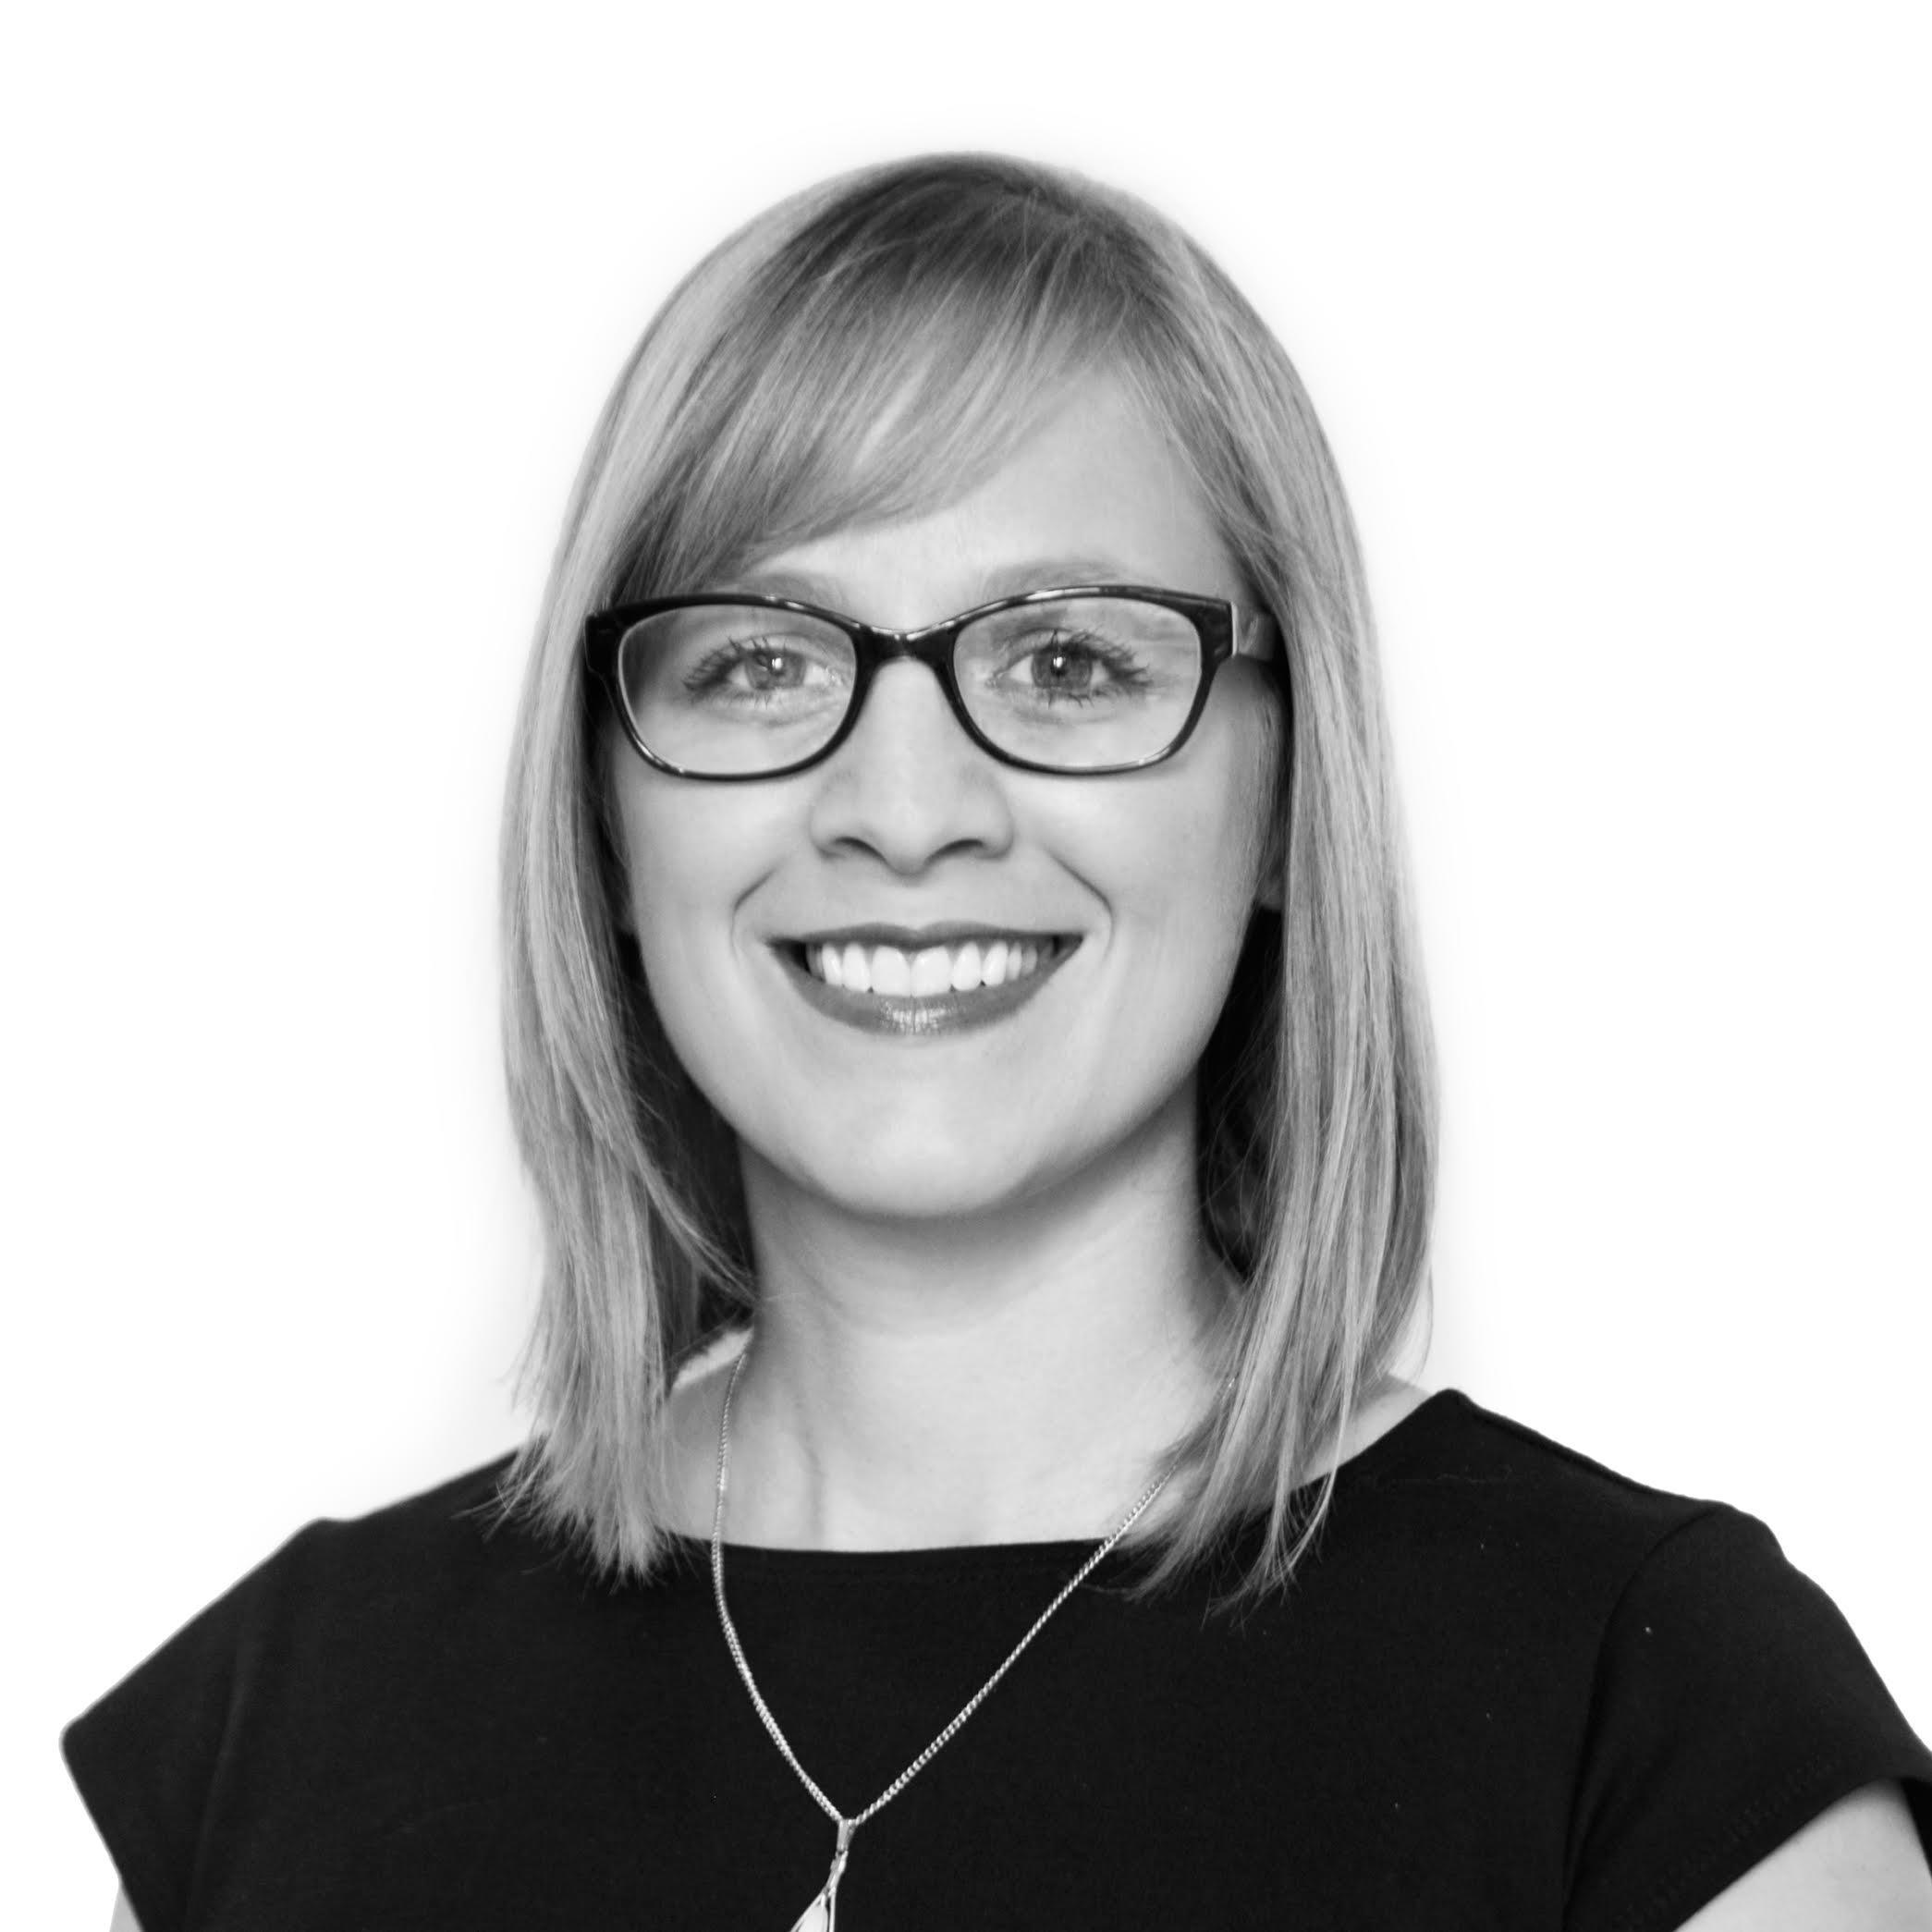 Anne Dudley, The Buzz Maker, Public Relations, PR, Account Coordinator, writer, editor, copywriter, MA.